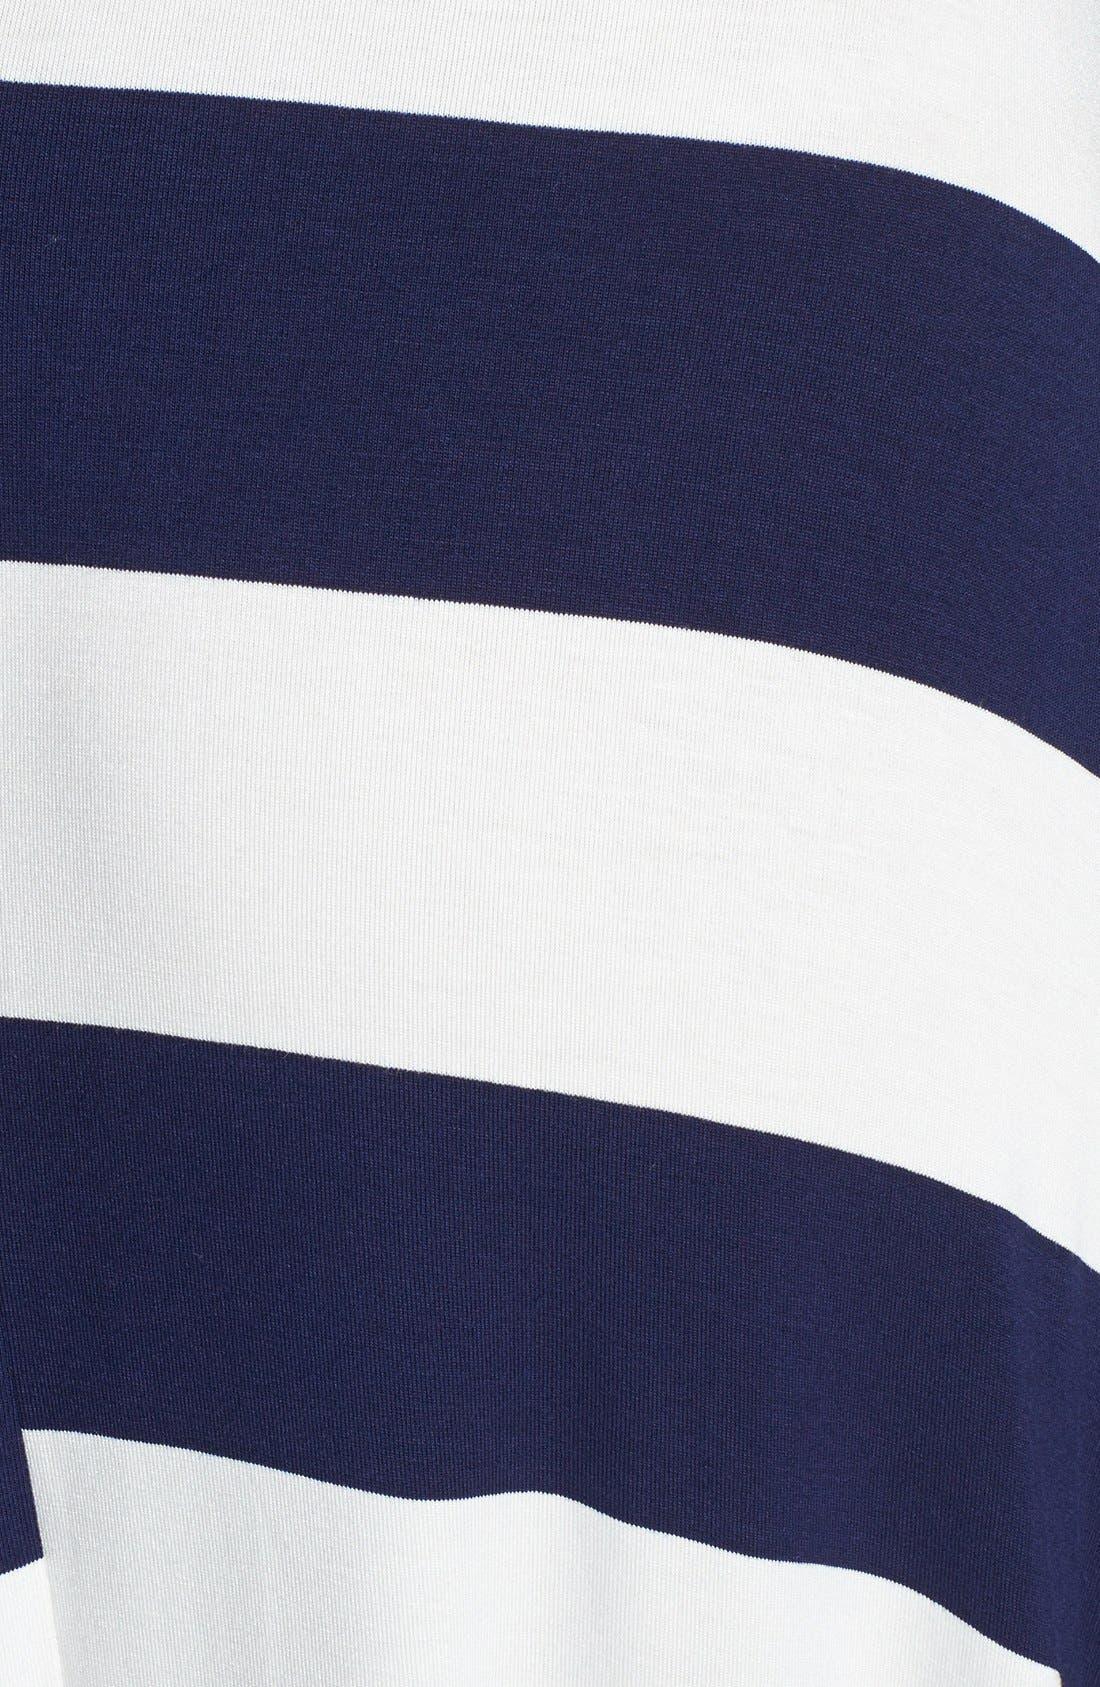 Alternate Image 3  - Elan Stripe Convertible Bias Cut Cover-Up Maxi Dress